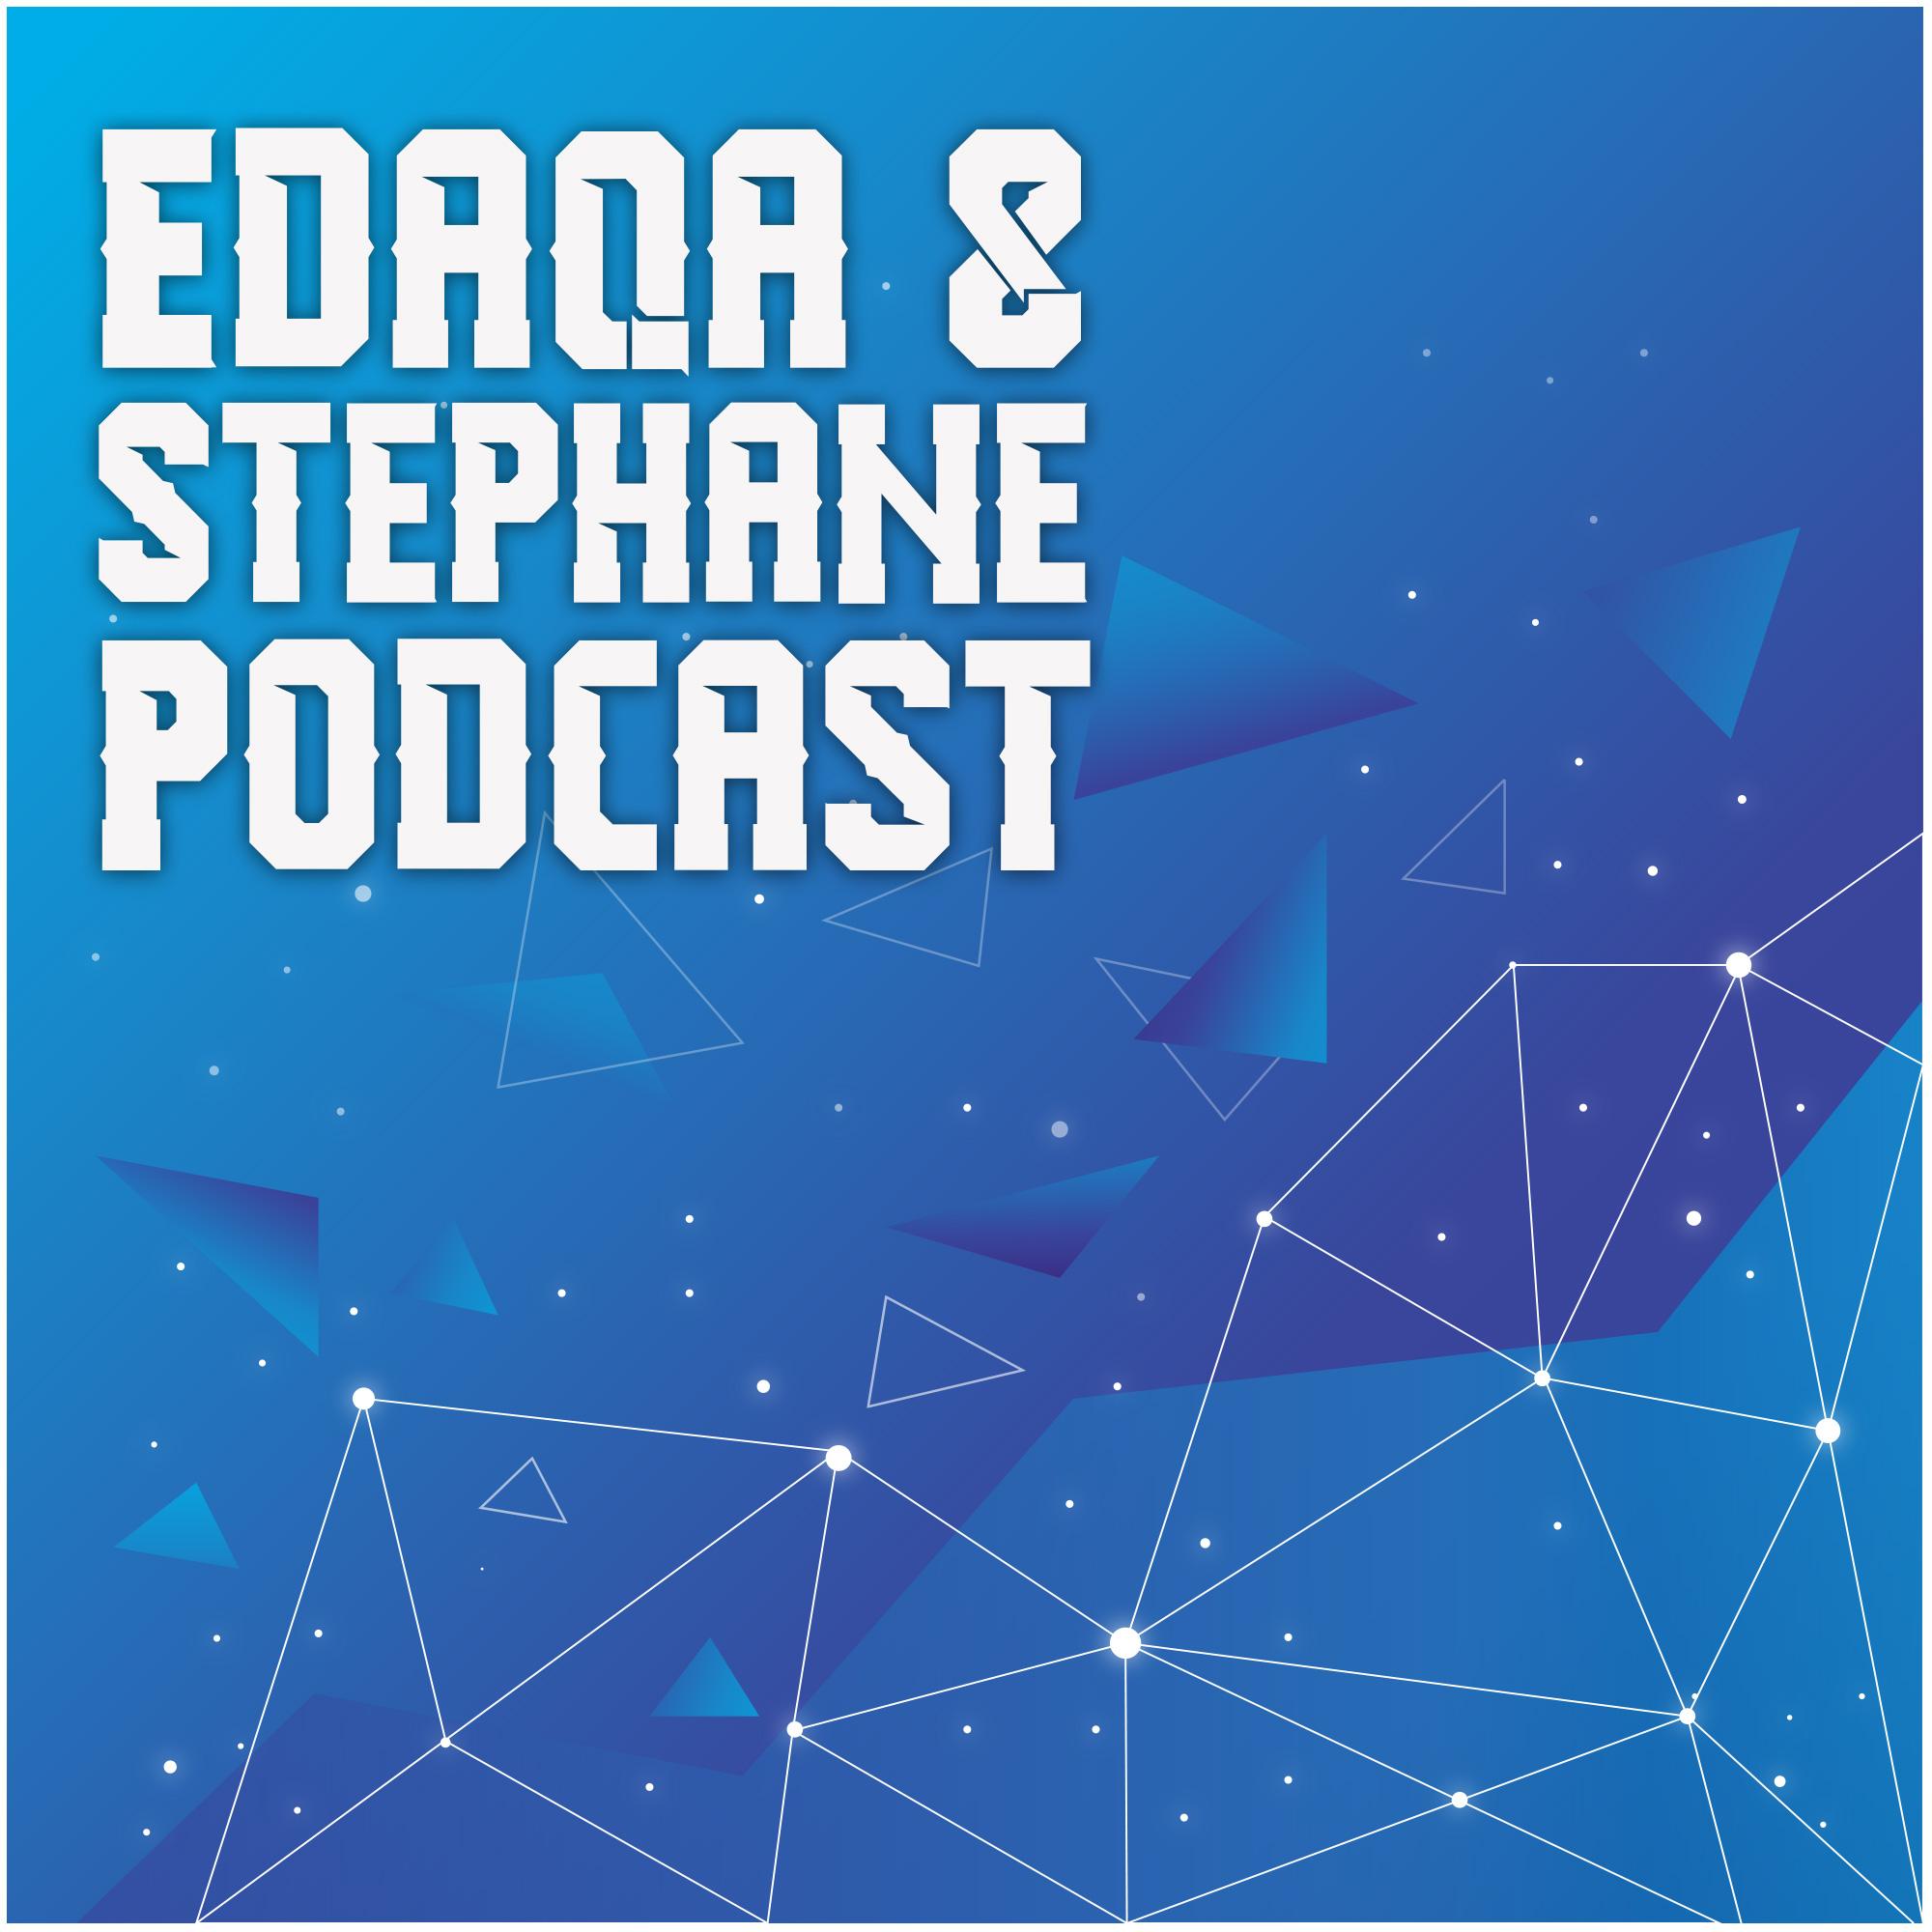 Edaqa & Stephane (Podcast)